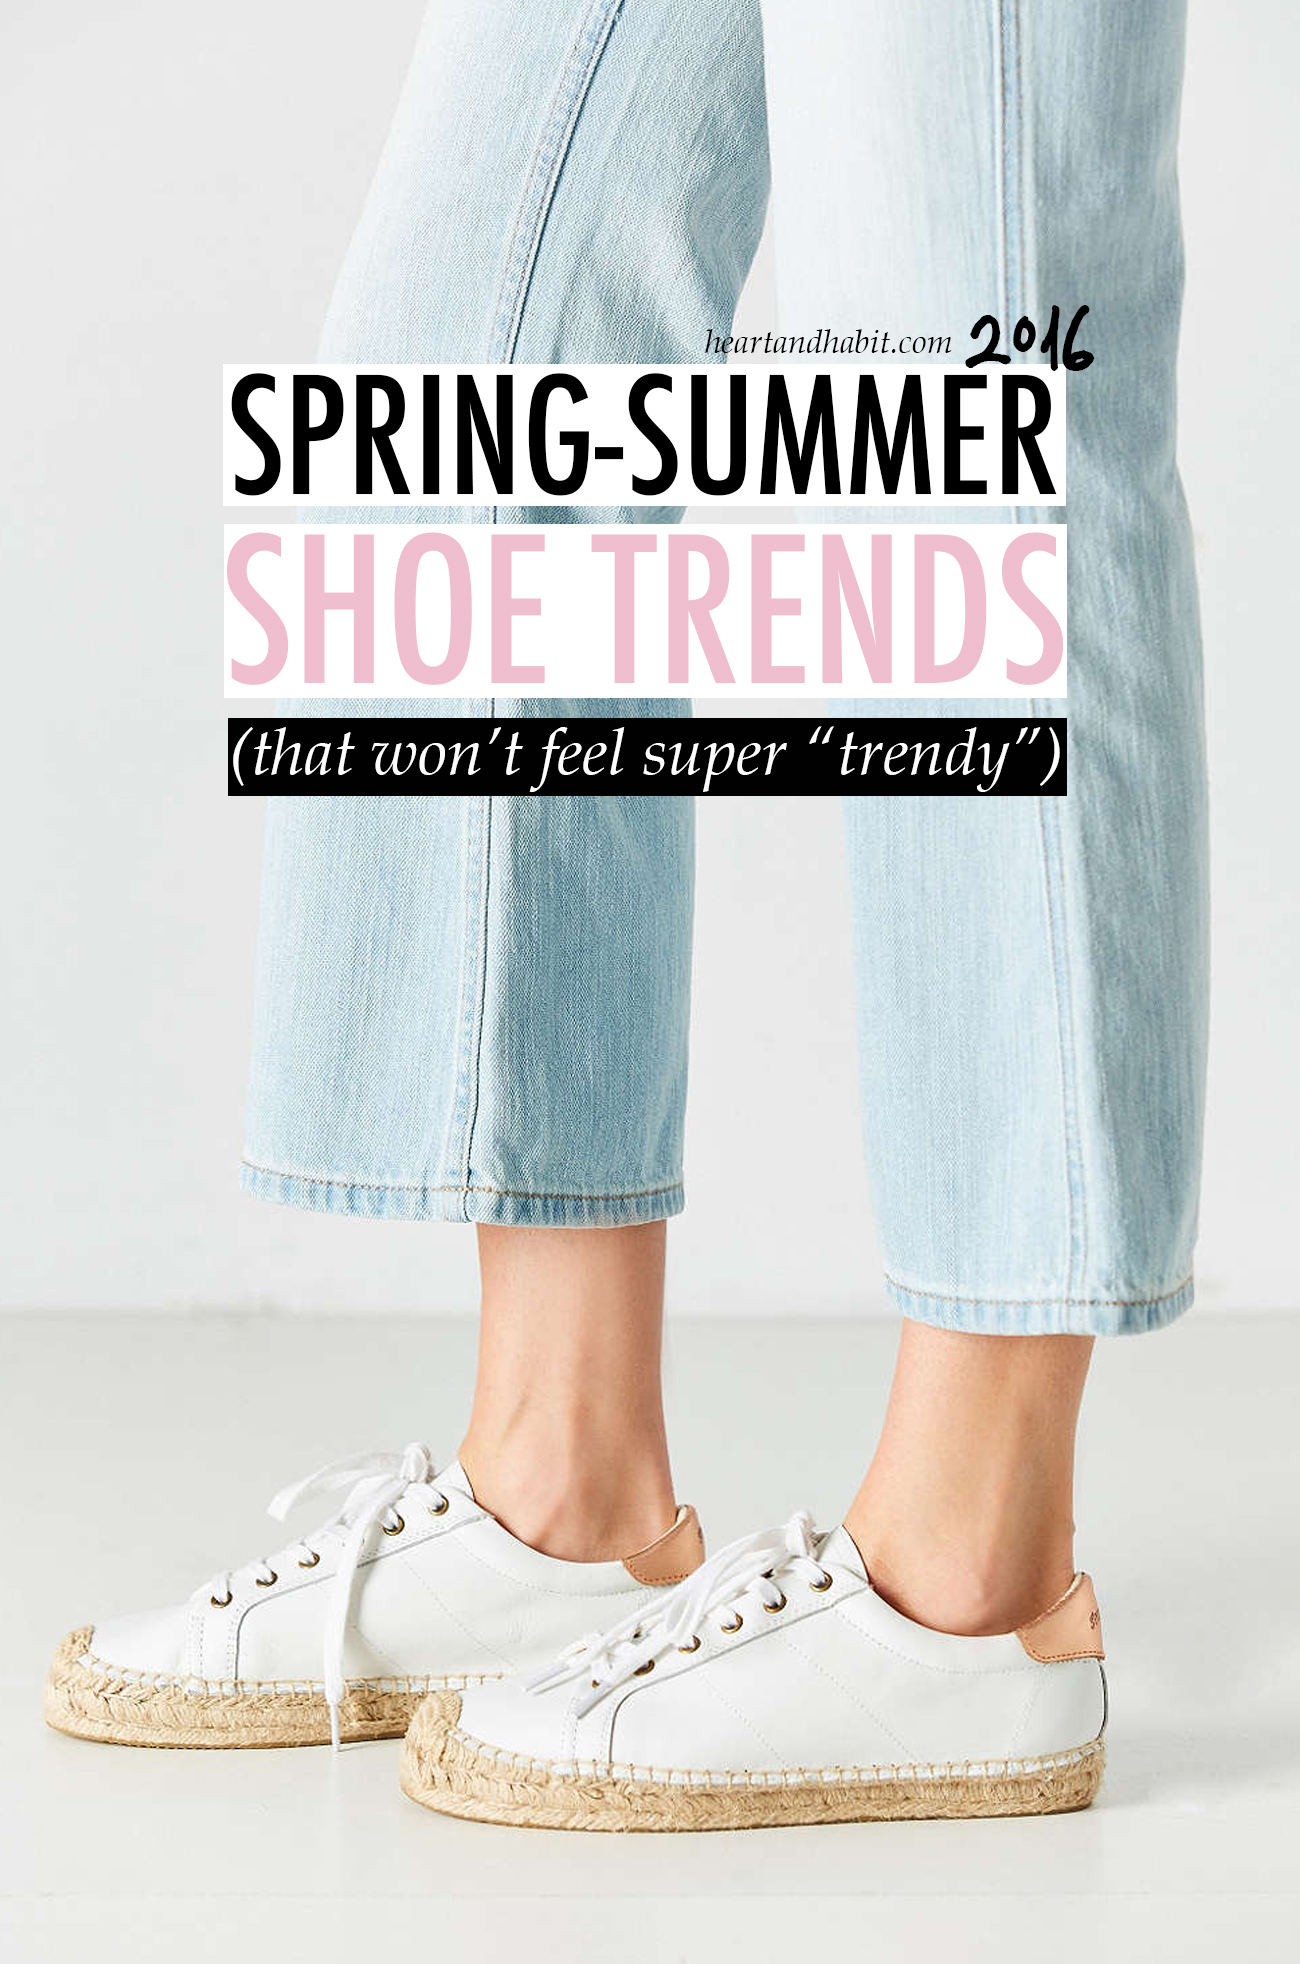 ss2016 shoe trends_2